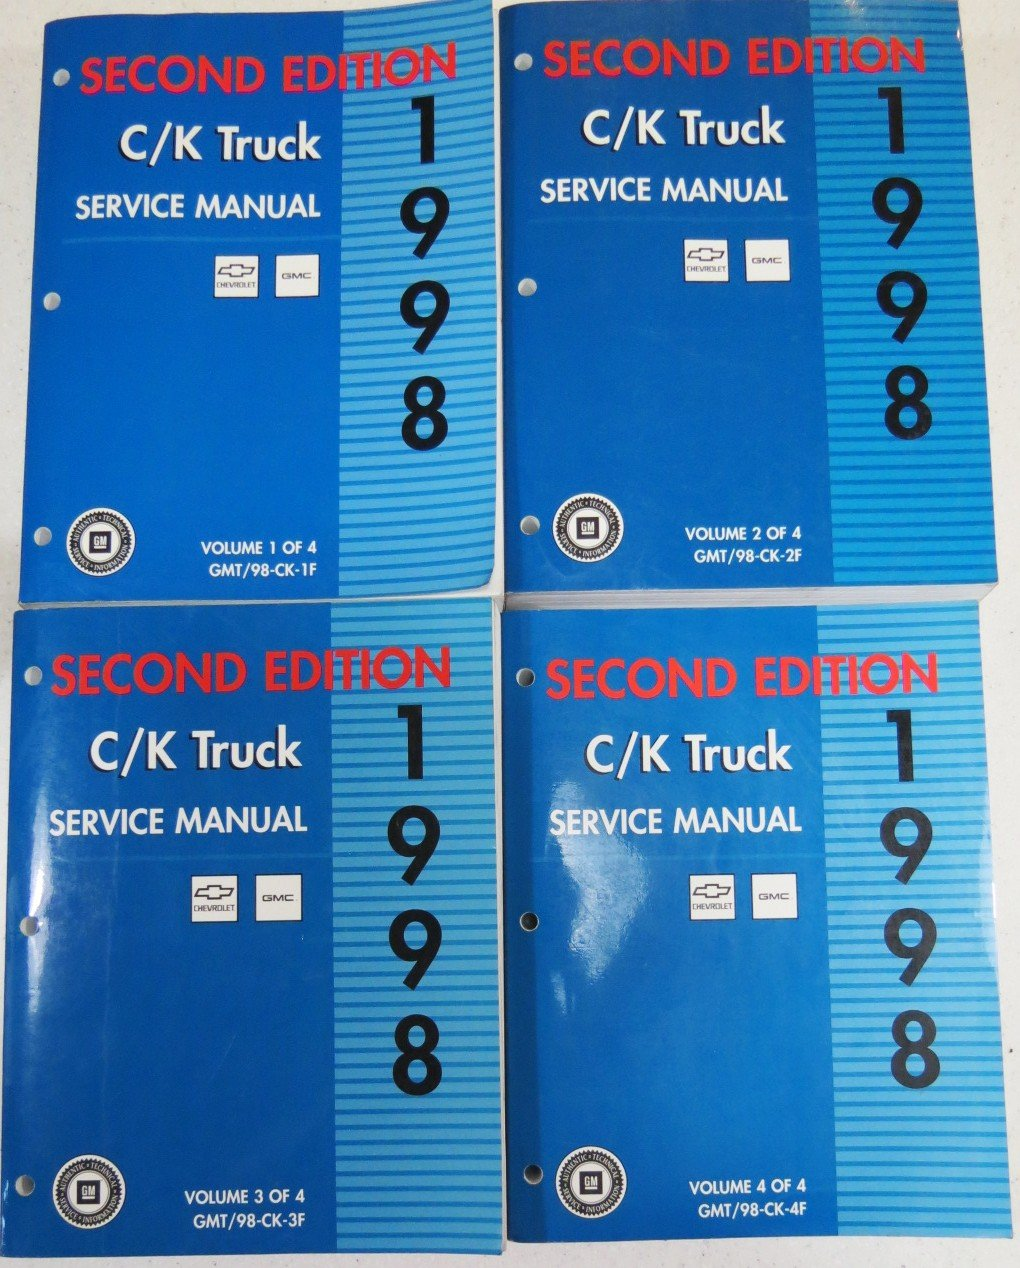 1998 GMC Chevy Silverado Sierra C/K Truck Service Manual SET DAMAGED 2nd  EDITION: gmc: Amazon.com: Books